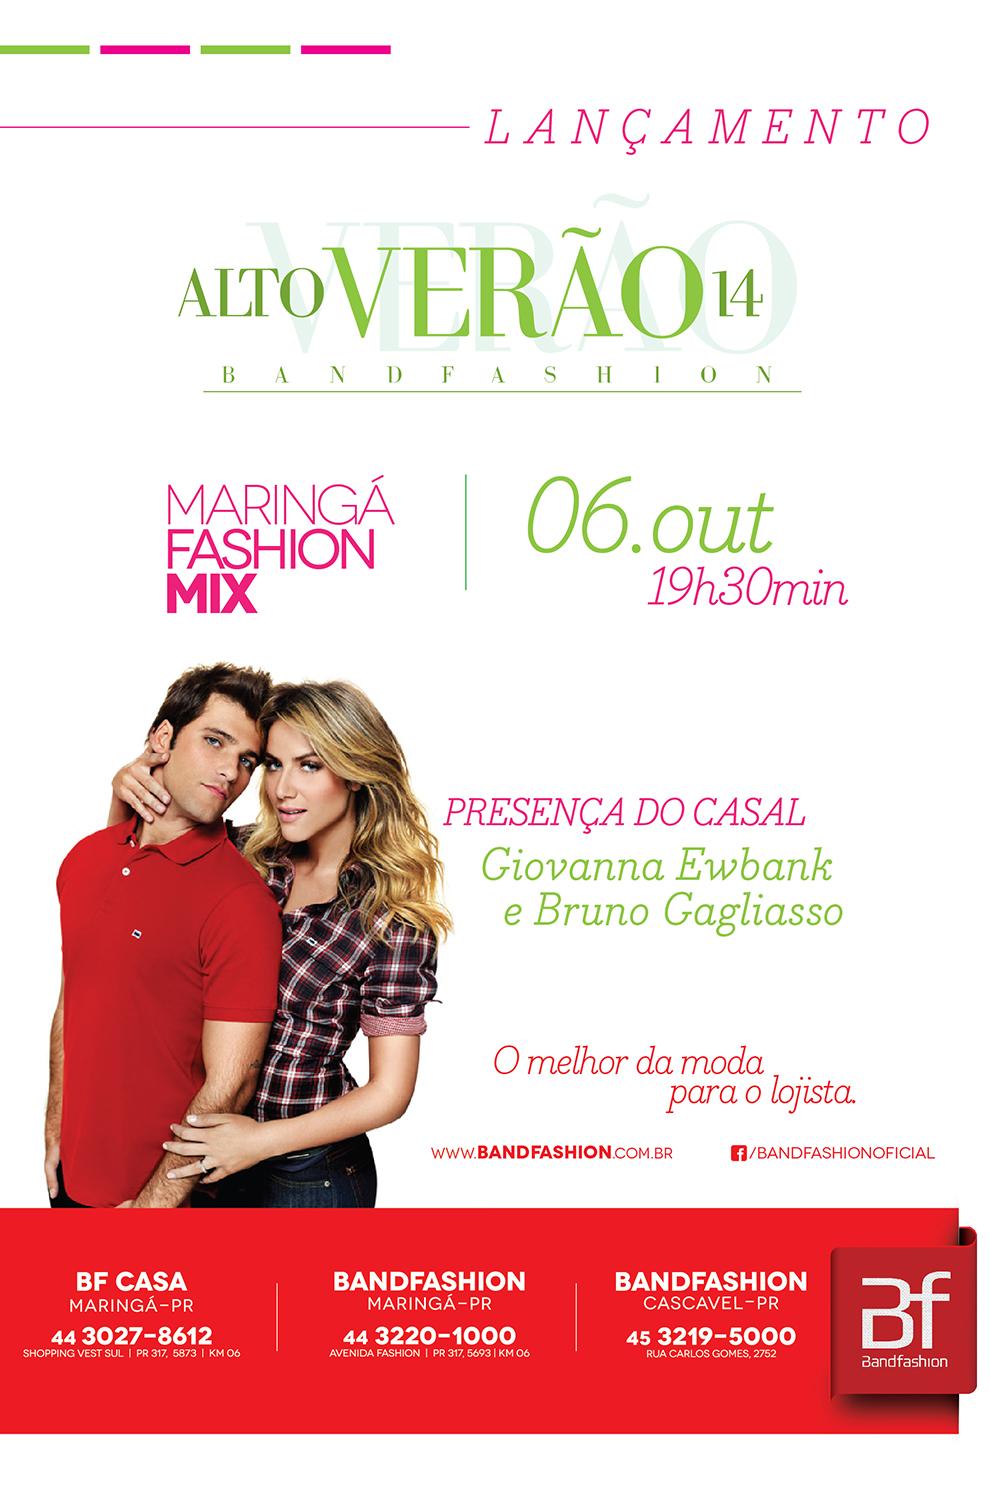 BF-001613C Newsletter Maringá Fashion Mix